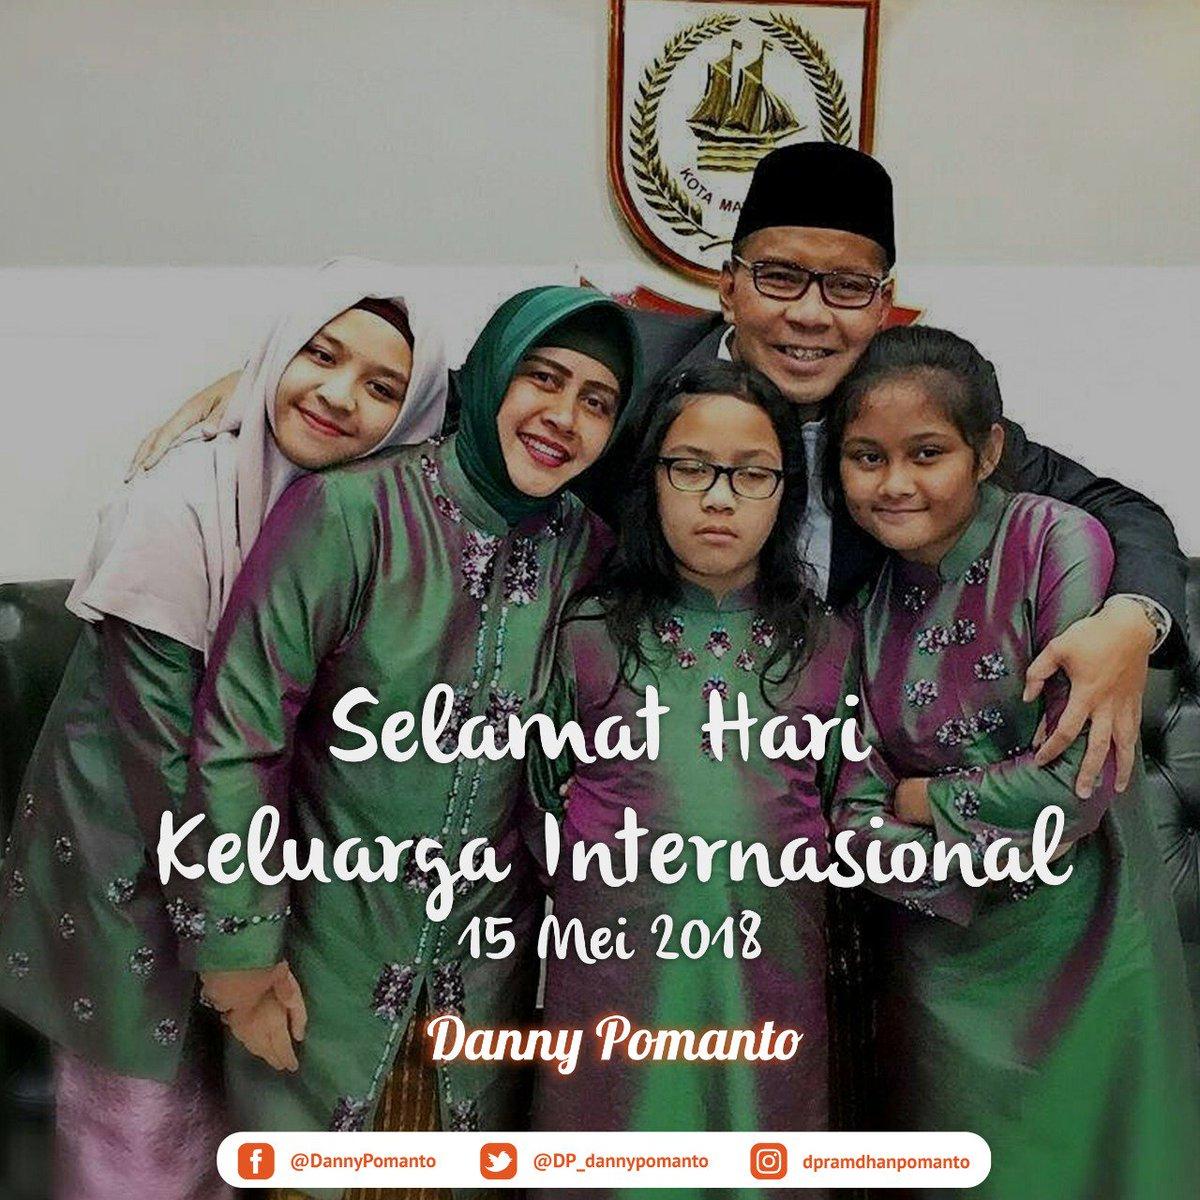 Selamat Hari Keluarga Internasional untuk seluruh keluarga yang ada di Indonesia. Keluarga adalah penyemangat hidup yang selalu memberikan dukungan kepada saya. Keluarga memang harta yang paling berharga.  @DP_dannypomanto https://t.co/0yh7yzj6oy